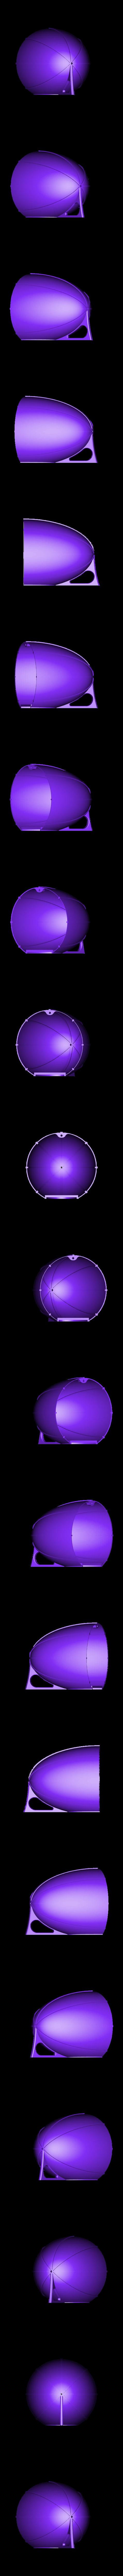 zep01.stl Download free STL file Battle zeppelin lamp • 3D print design, vd_max